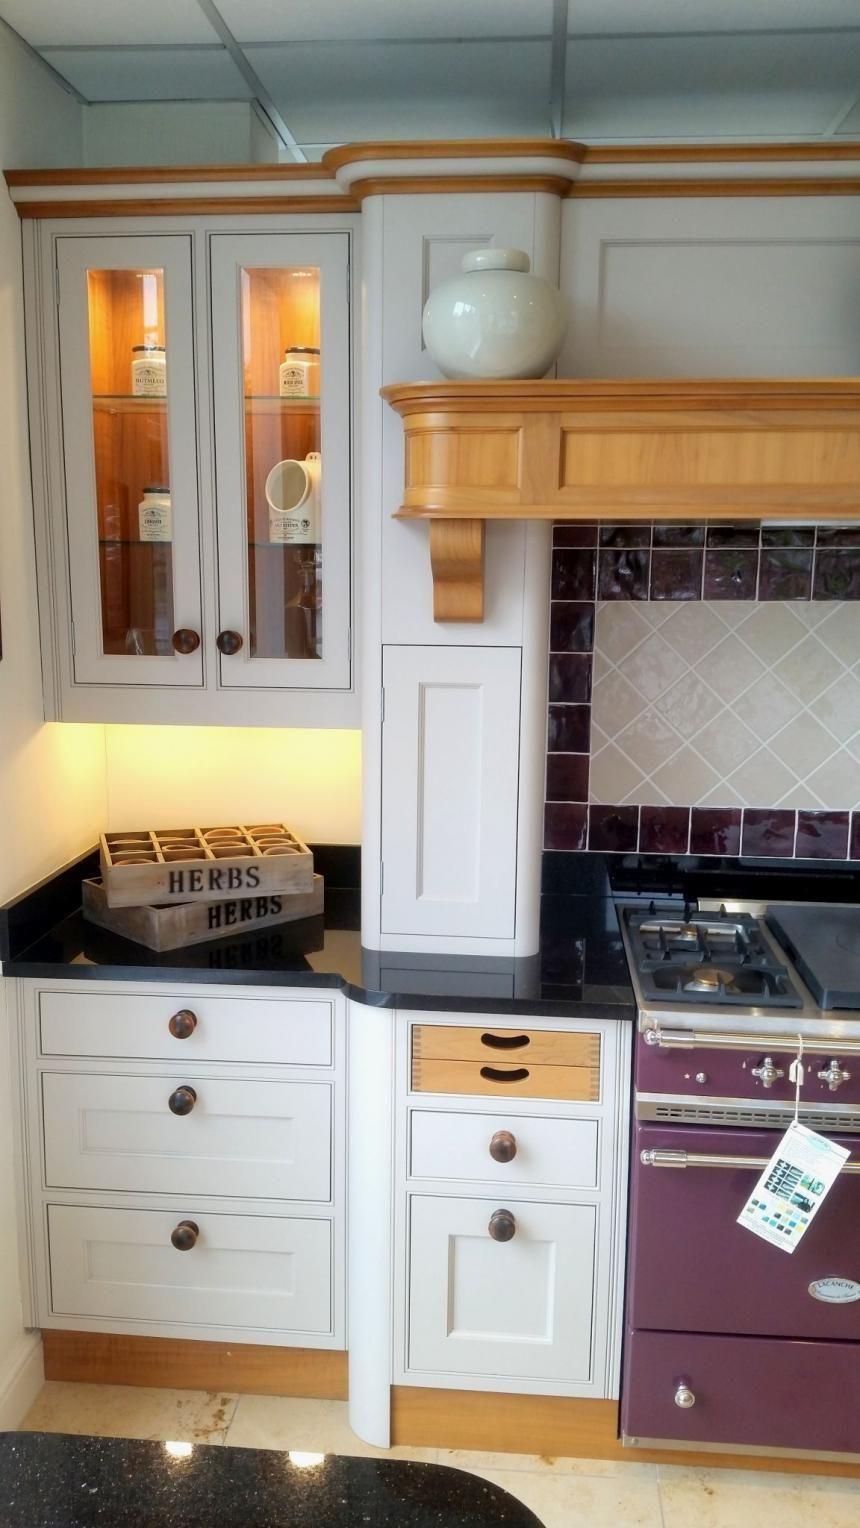 Painted Kitchen Cabinet Doors In 2020 Kitchen Cabinets For Sale Kitchen Cabinets Walnut Kitchen